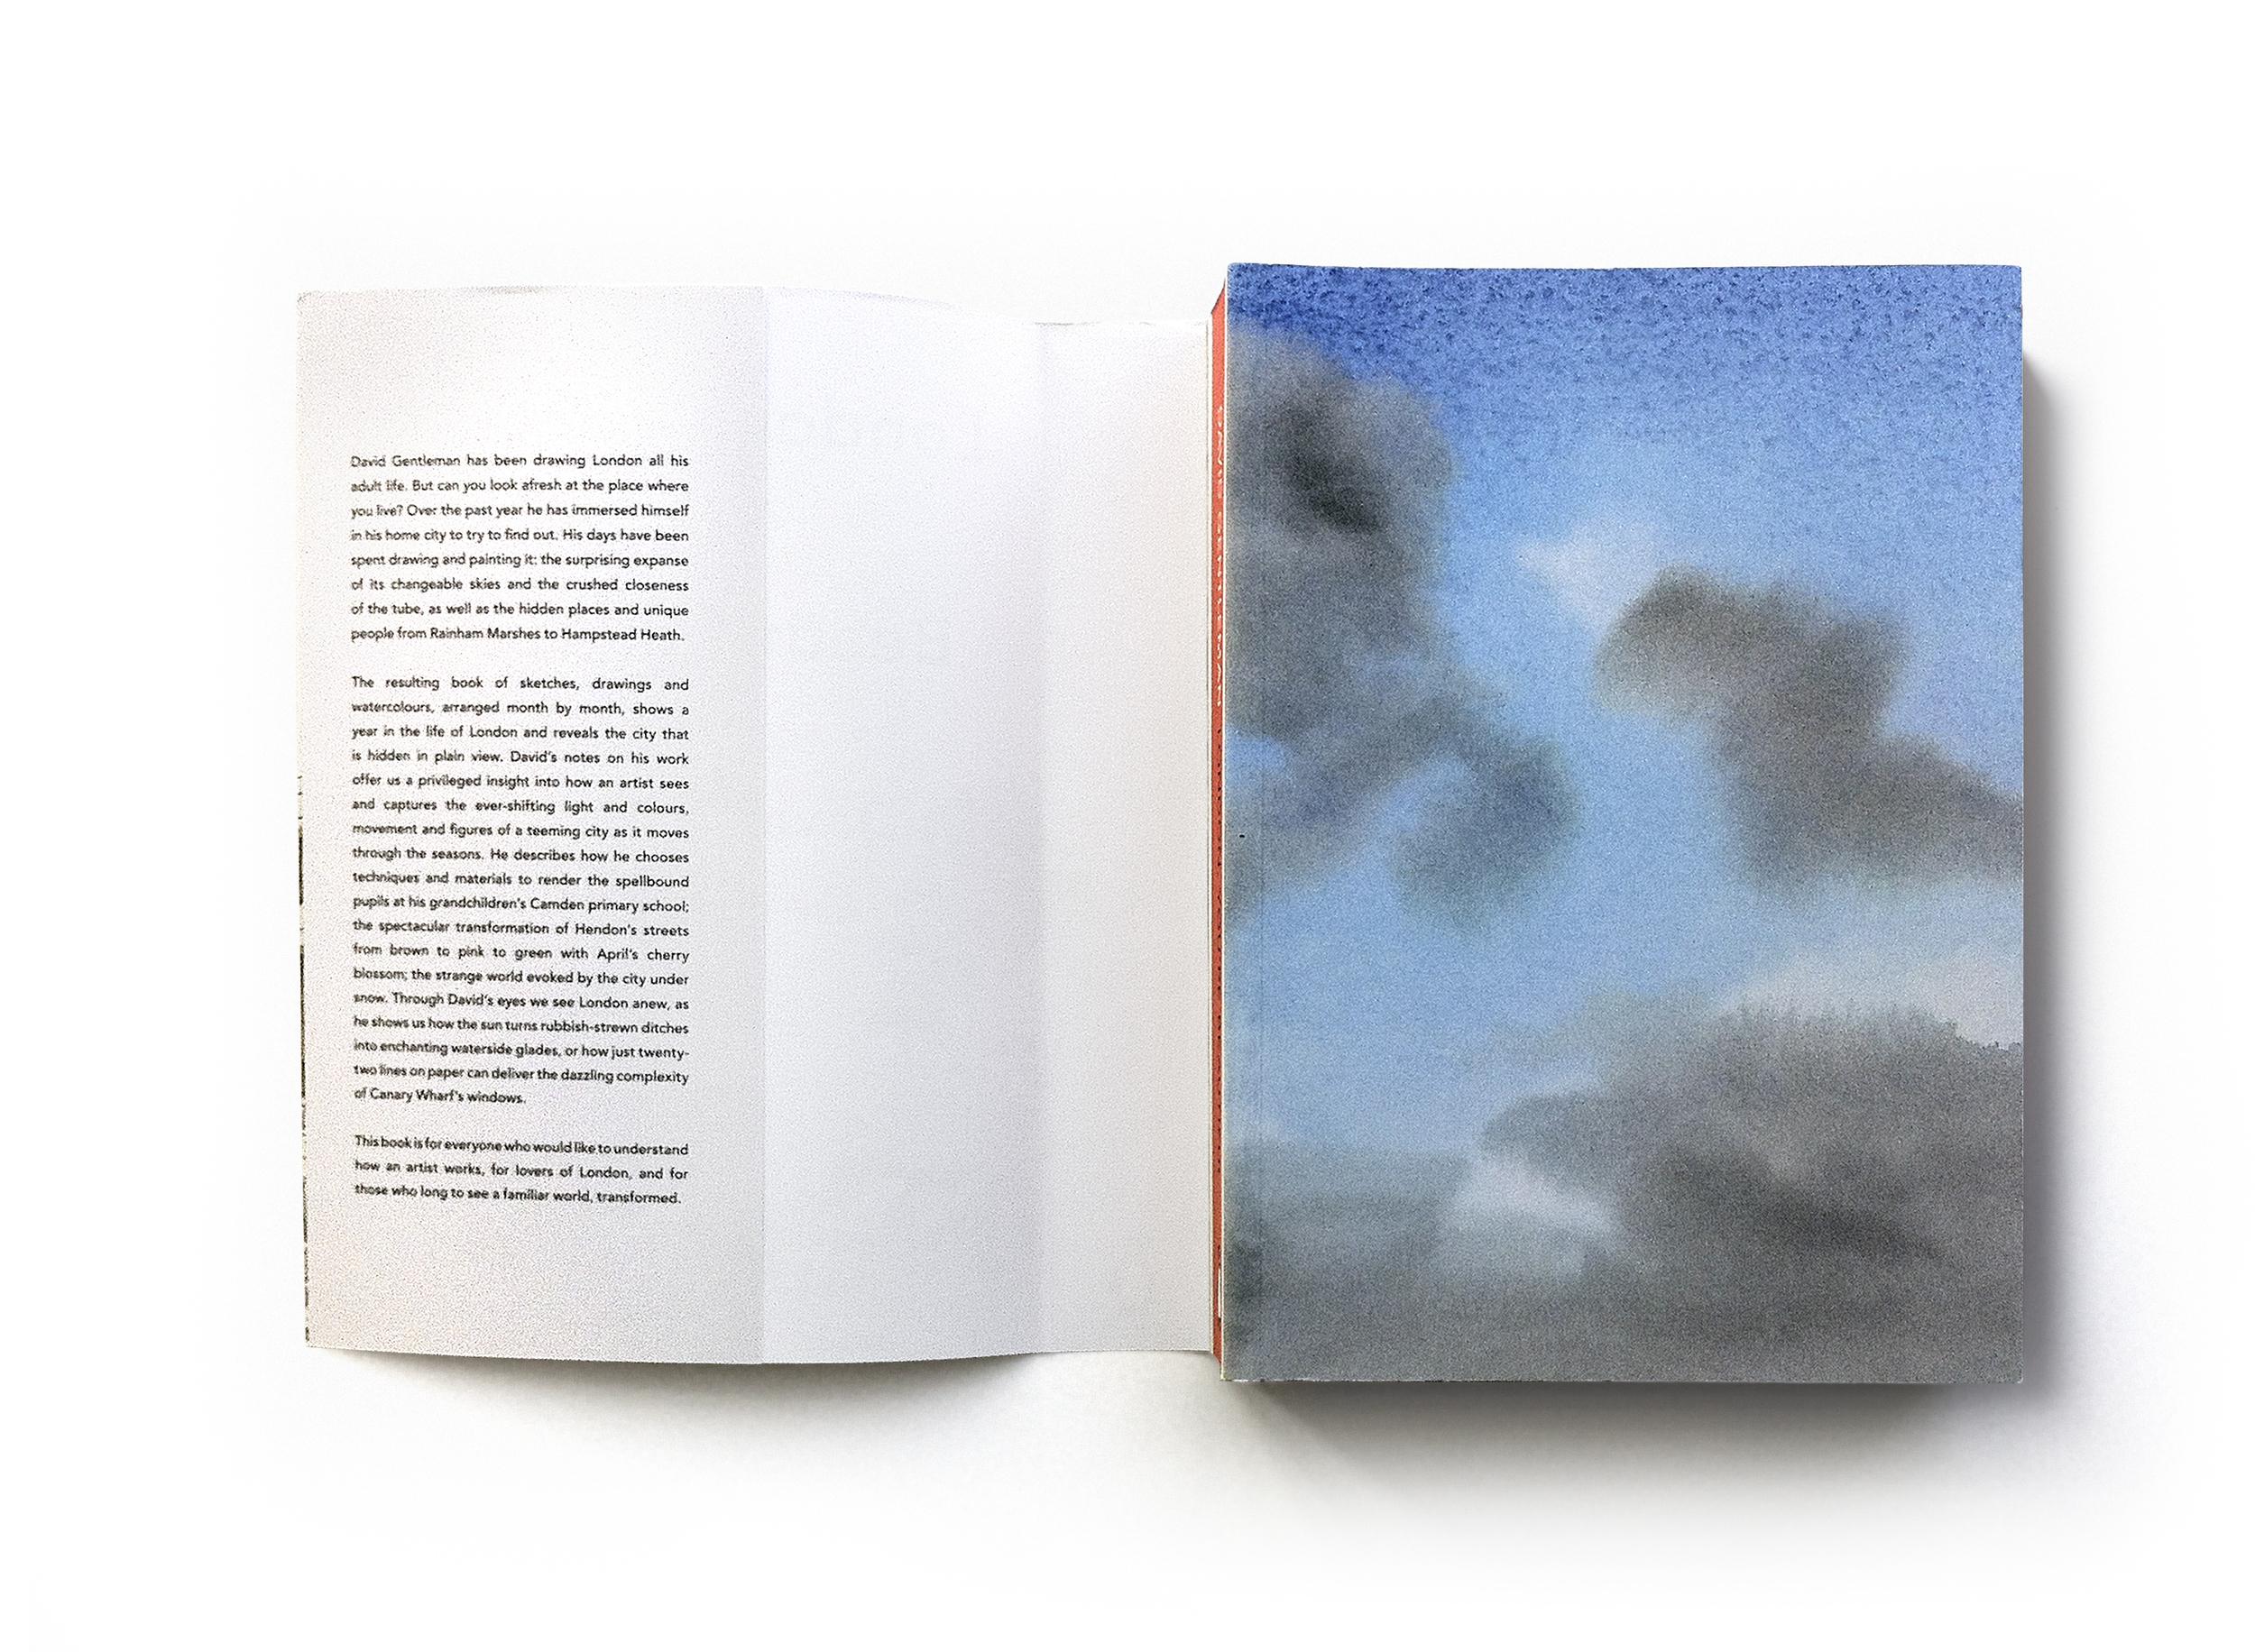 London, You're Beautiful by David Gentleman (Inner cover) - Art & words: David Gentleman Art direction: Jim Stoddart